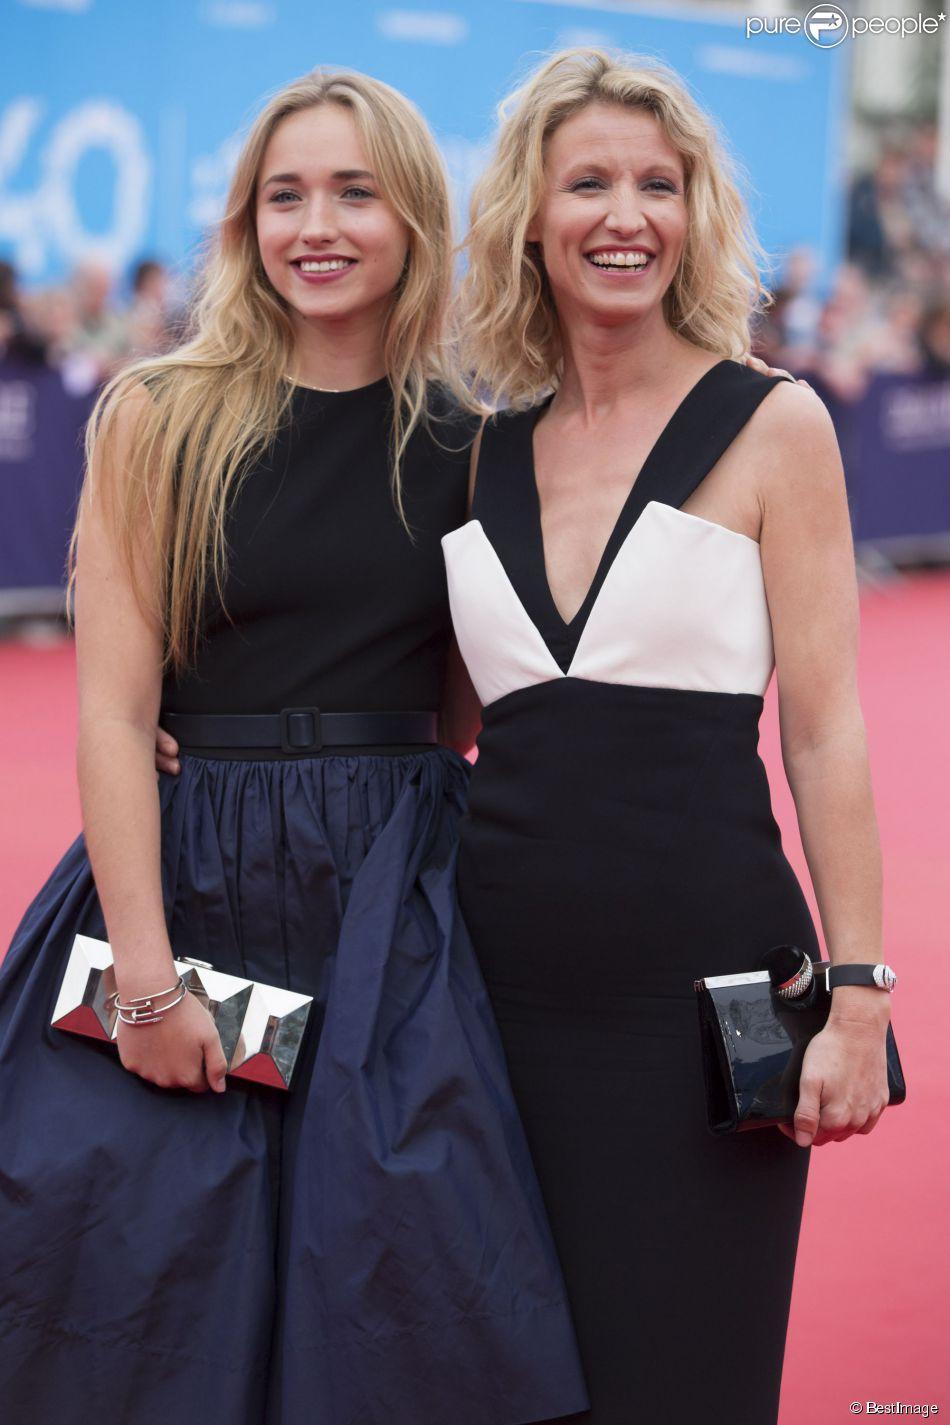 Alexandra lamy et sa fille chlo jouannet un duo for Famille dujardin